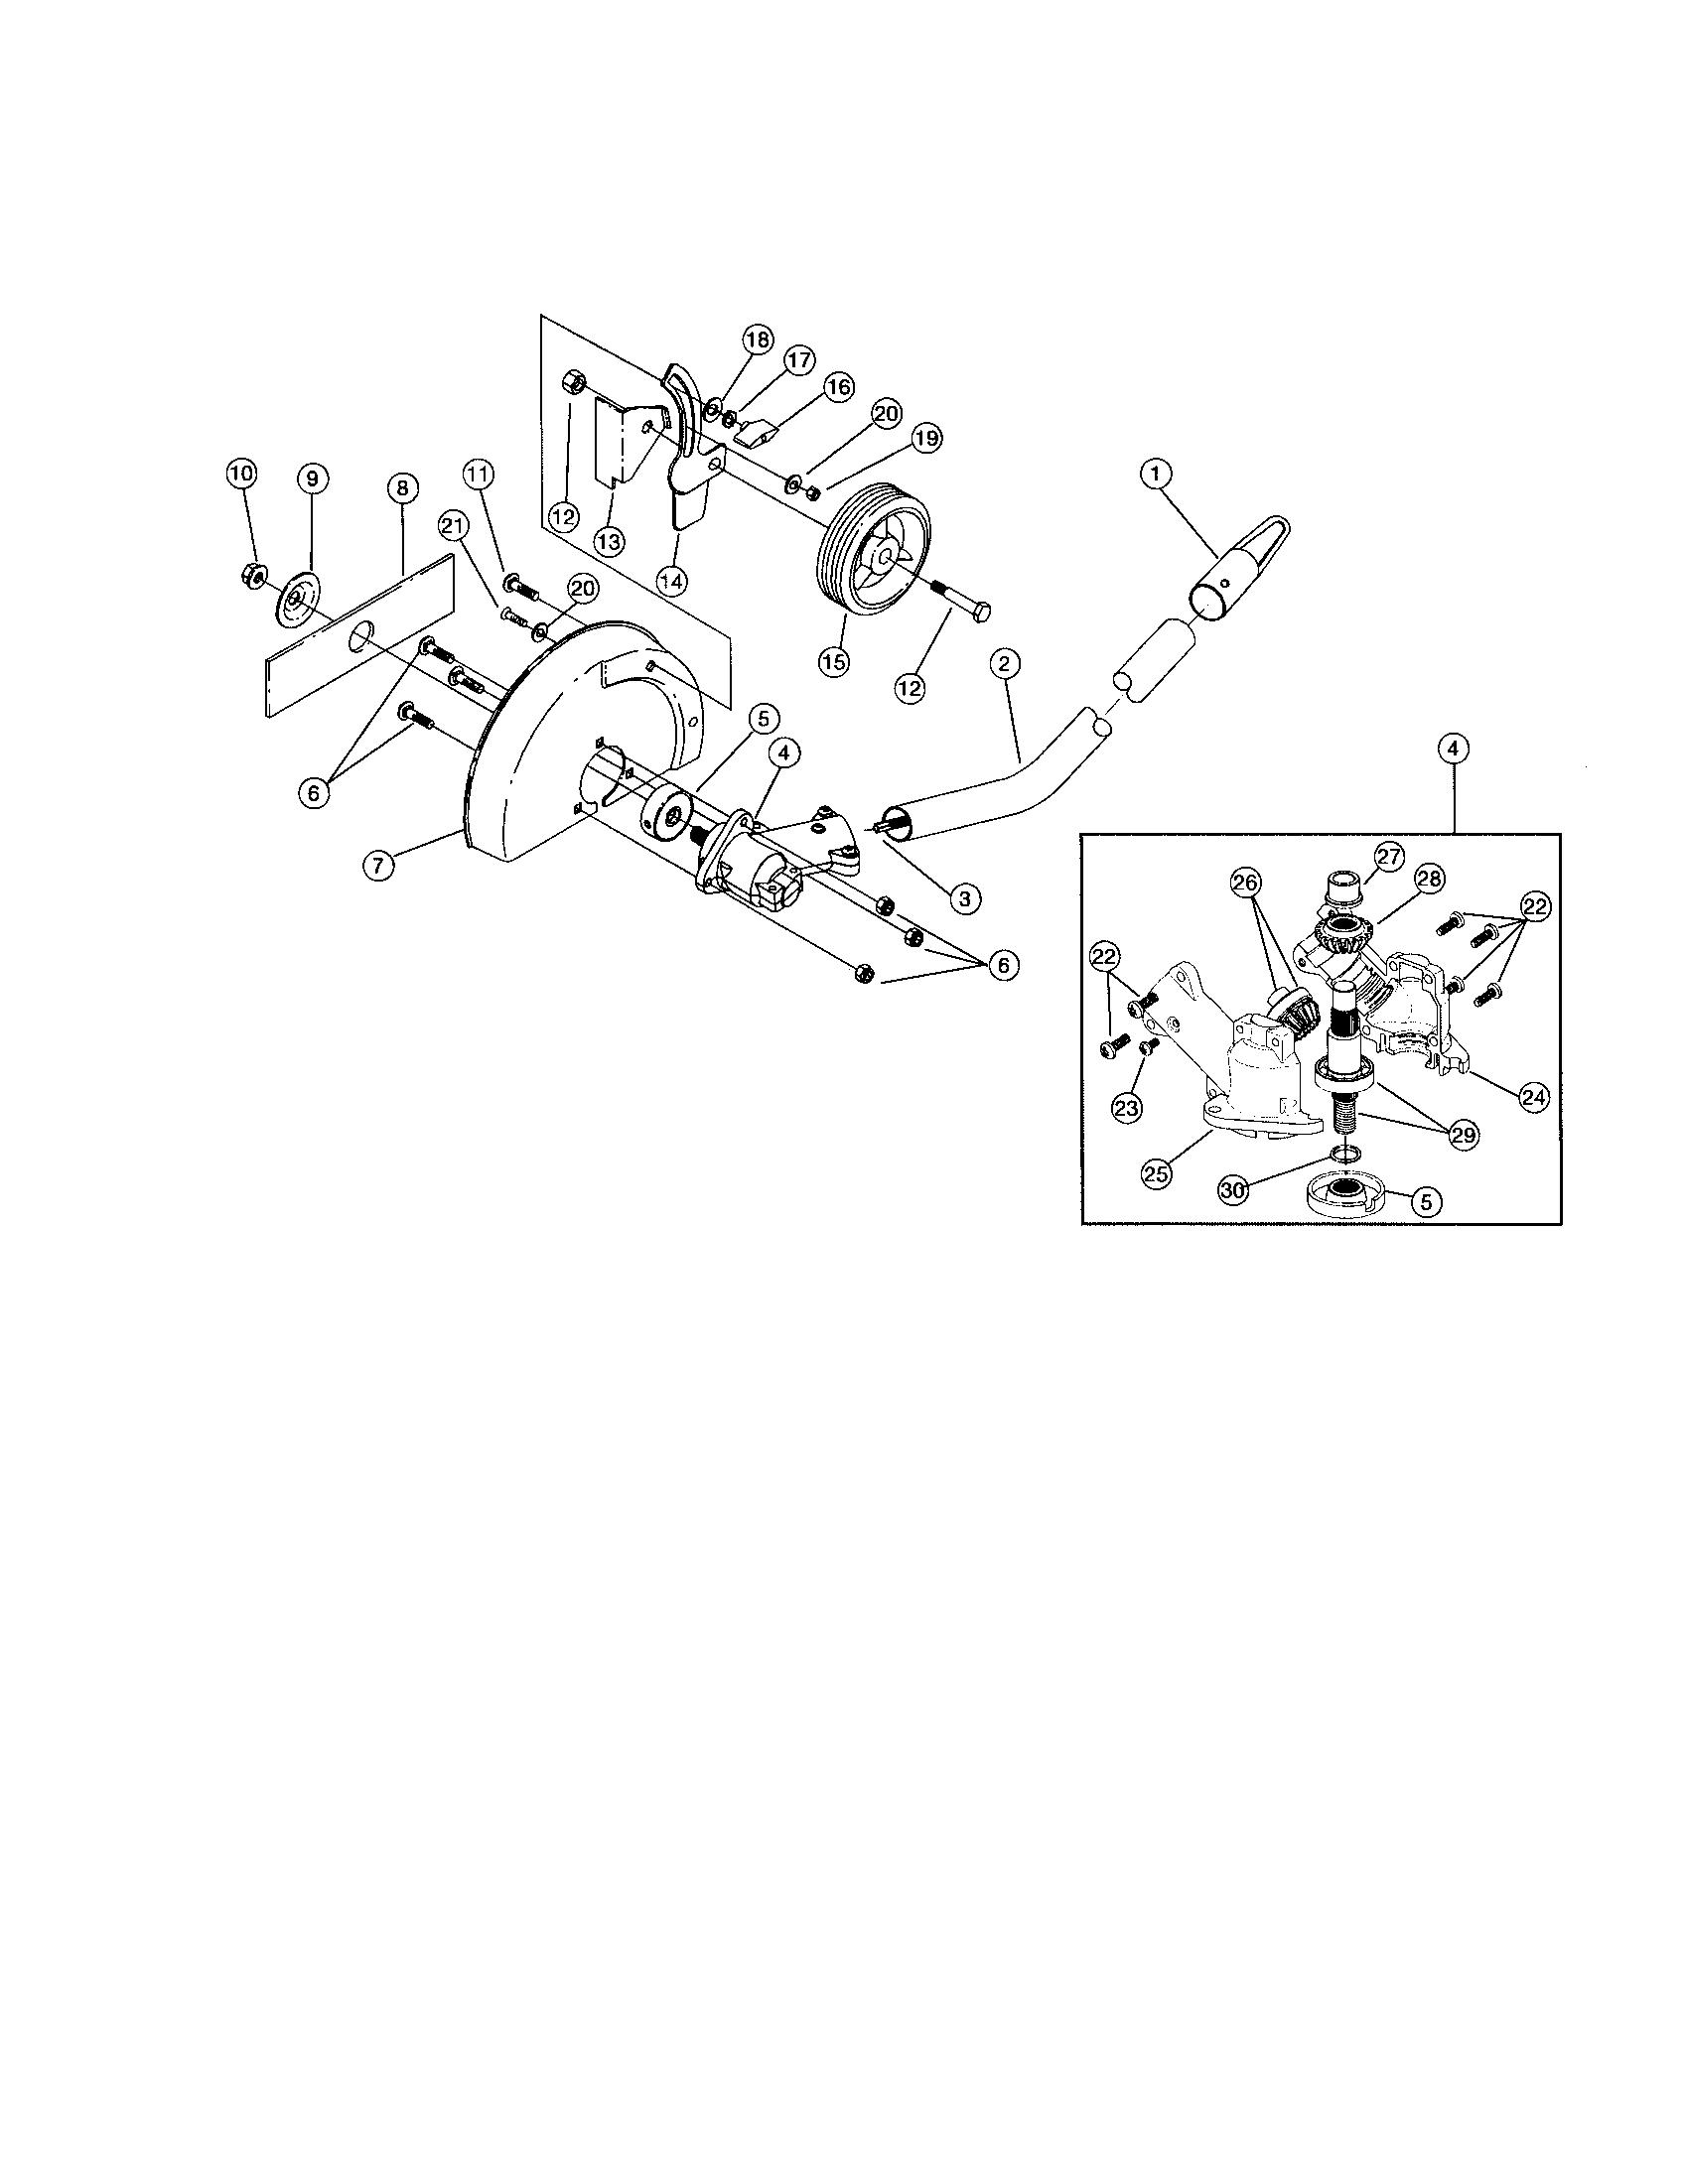 edger diagram  u0026 parts list for model 725re ryobi